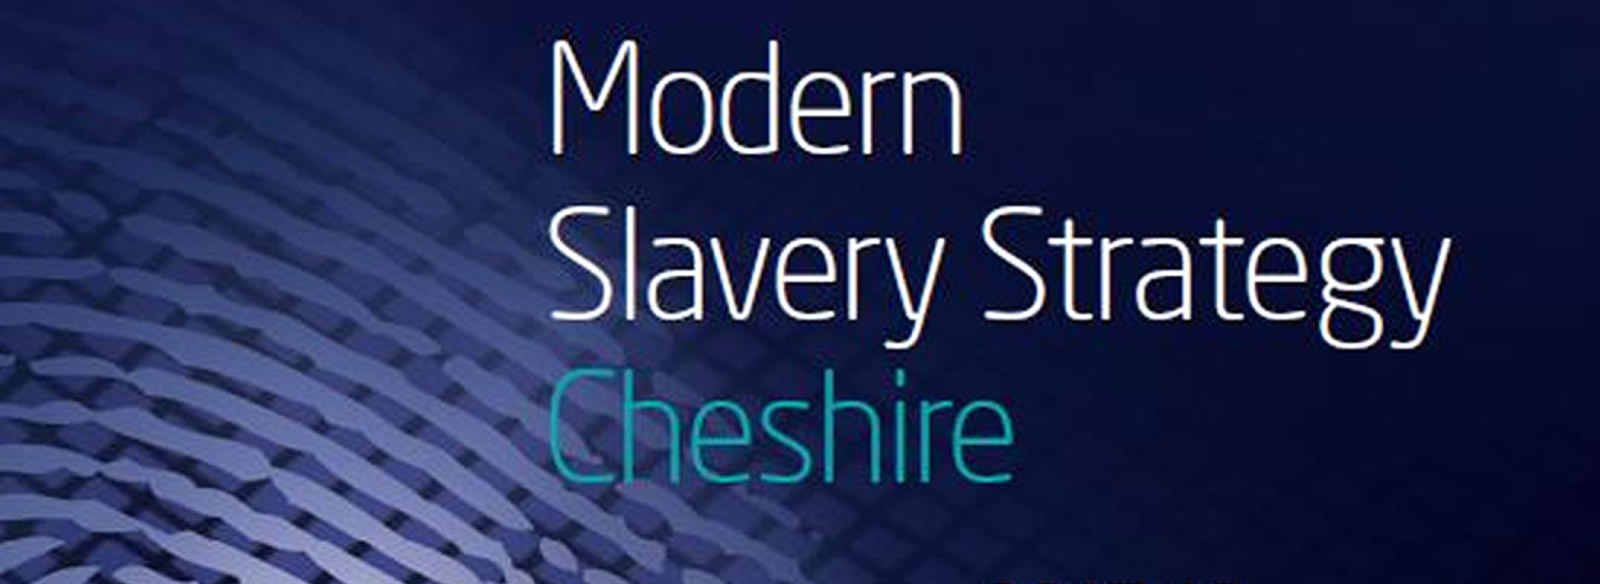 1600-Modern Slavery Strategy